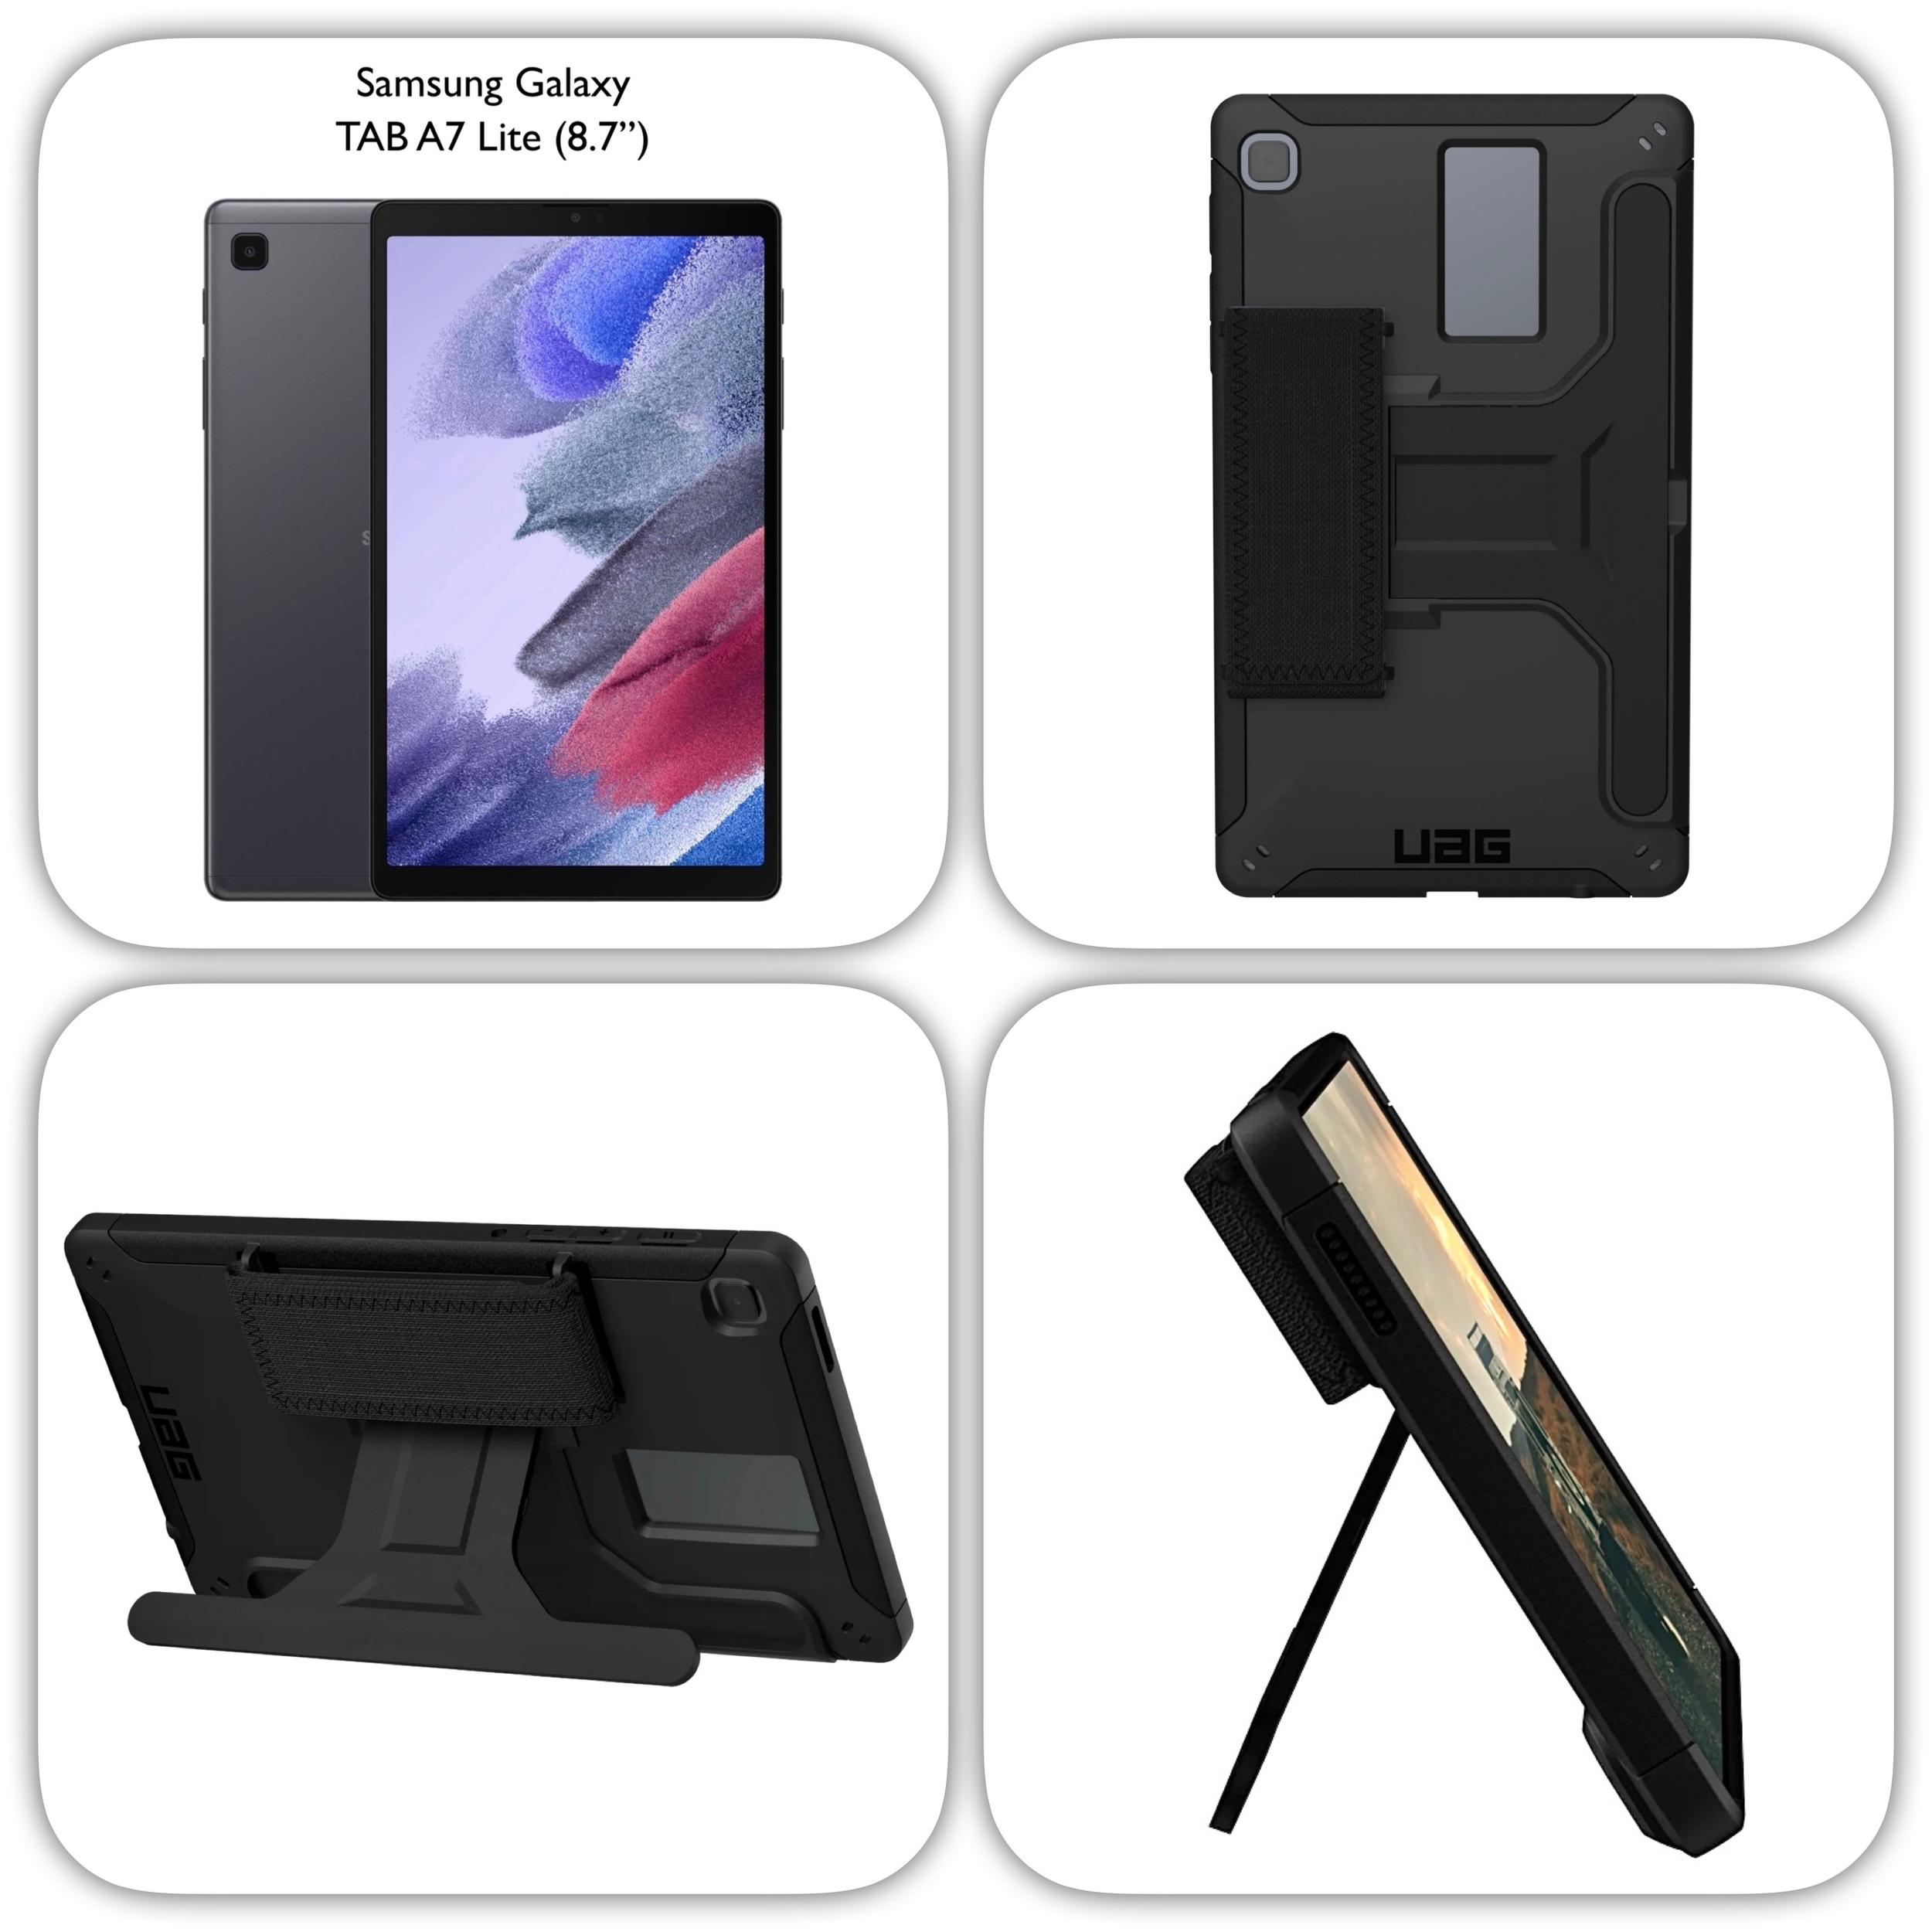 REF 2555 Pack 2 en 1 Galaxy TAB A7 LITE 8.7p Coque Armure Sangle main et verre de protection ecran